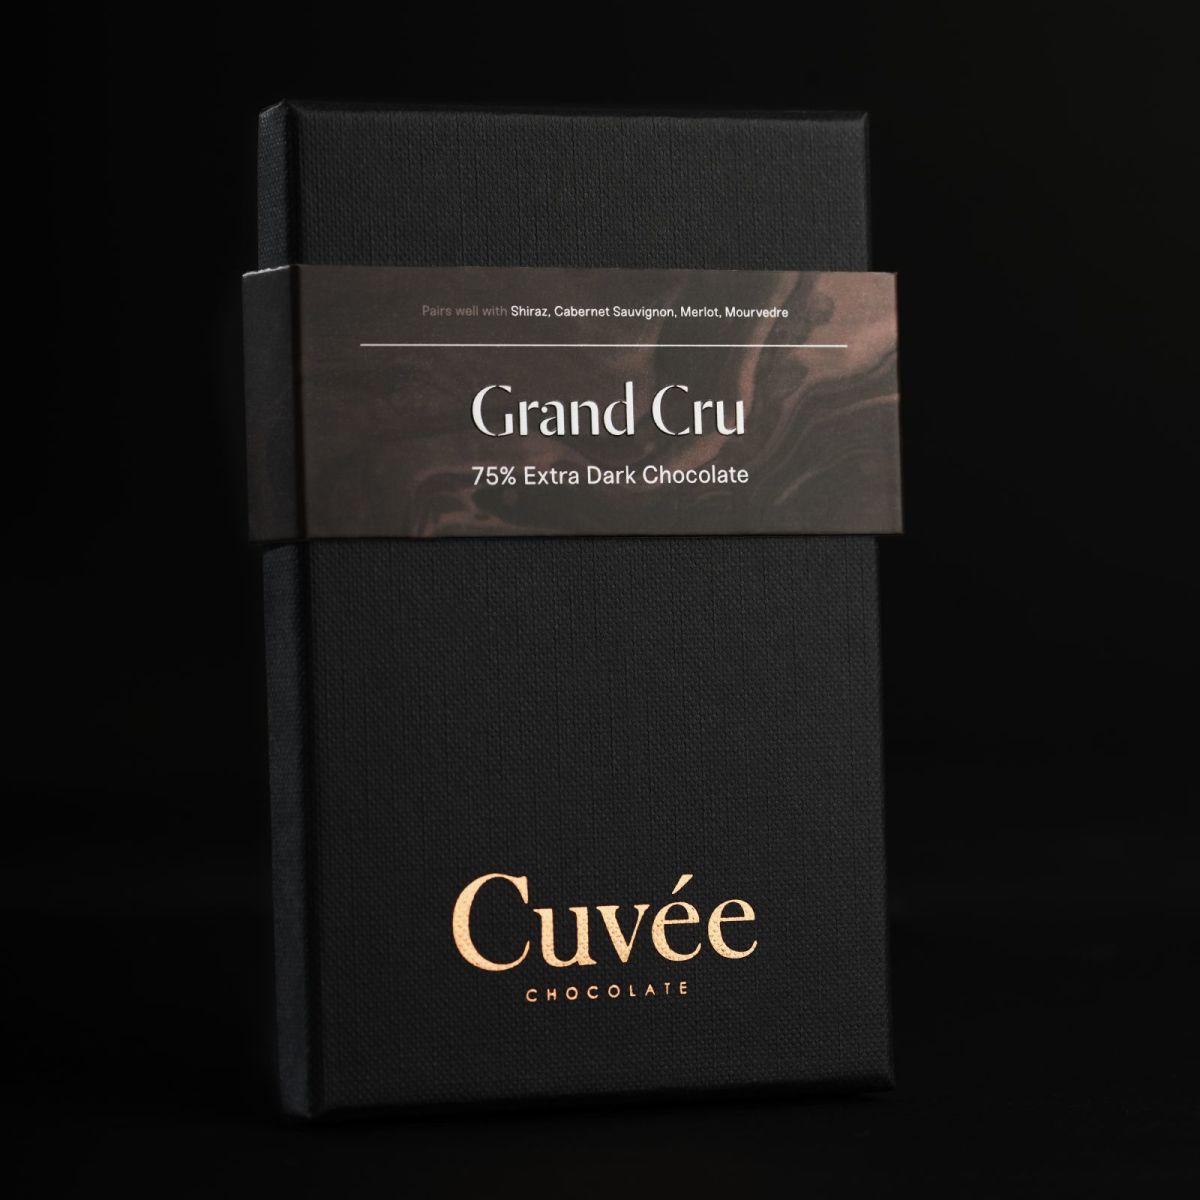 Cuvée Chocolate - Grand Cru 75% Extra Dark Chocolate